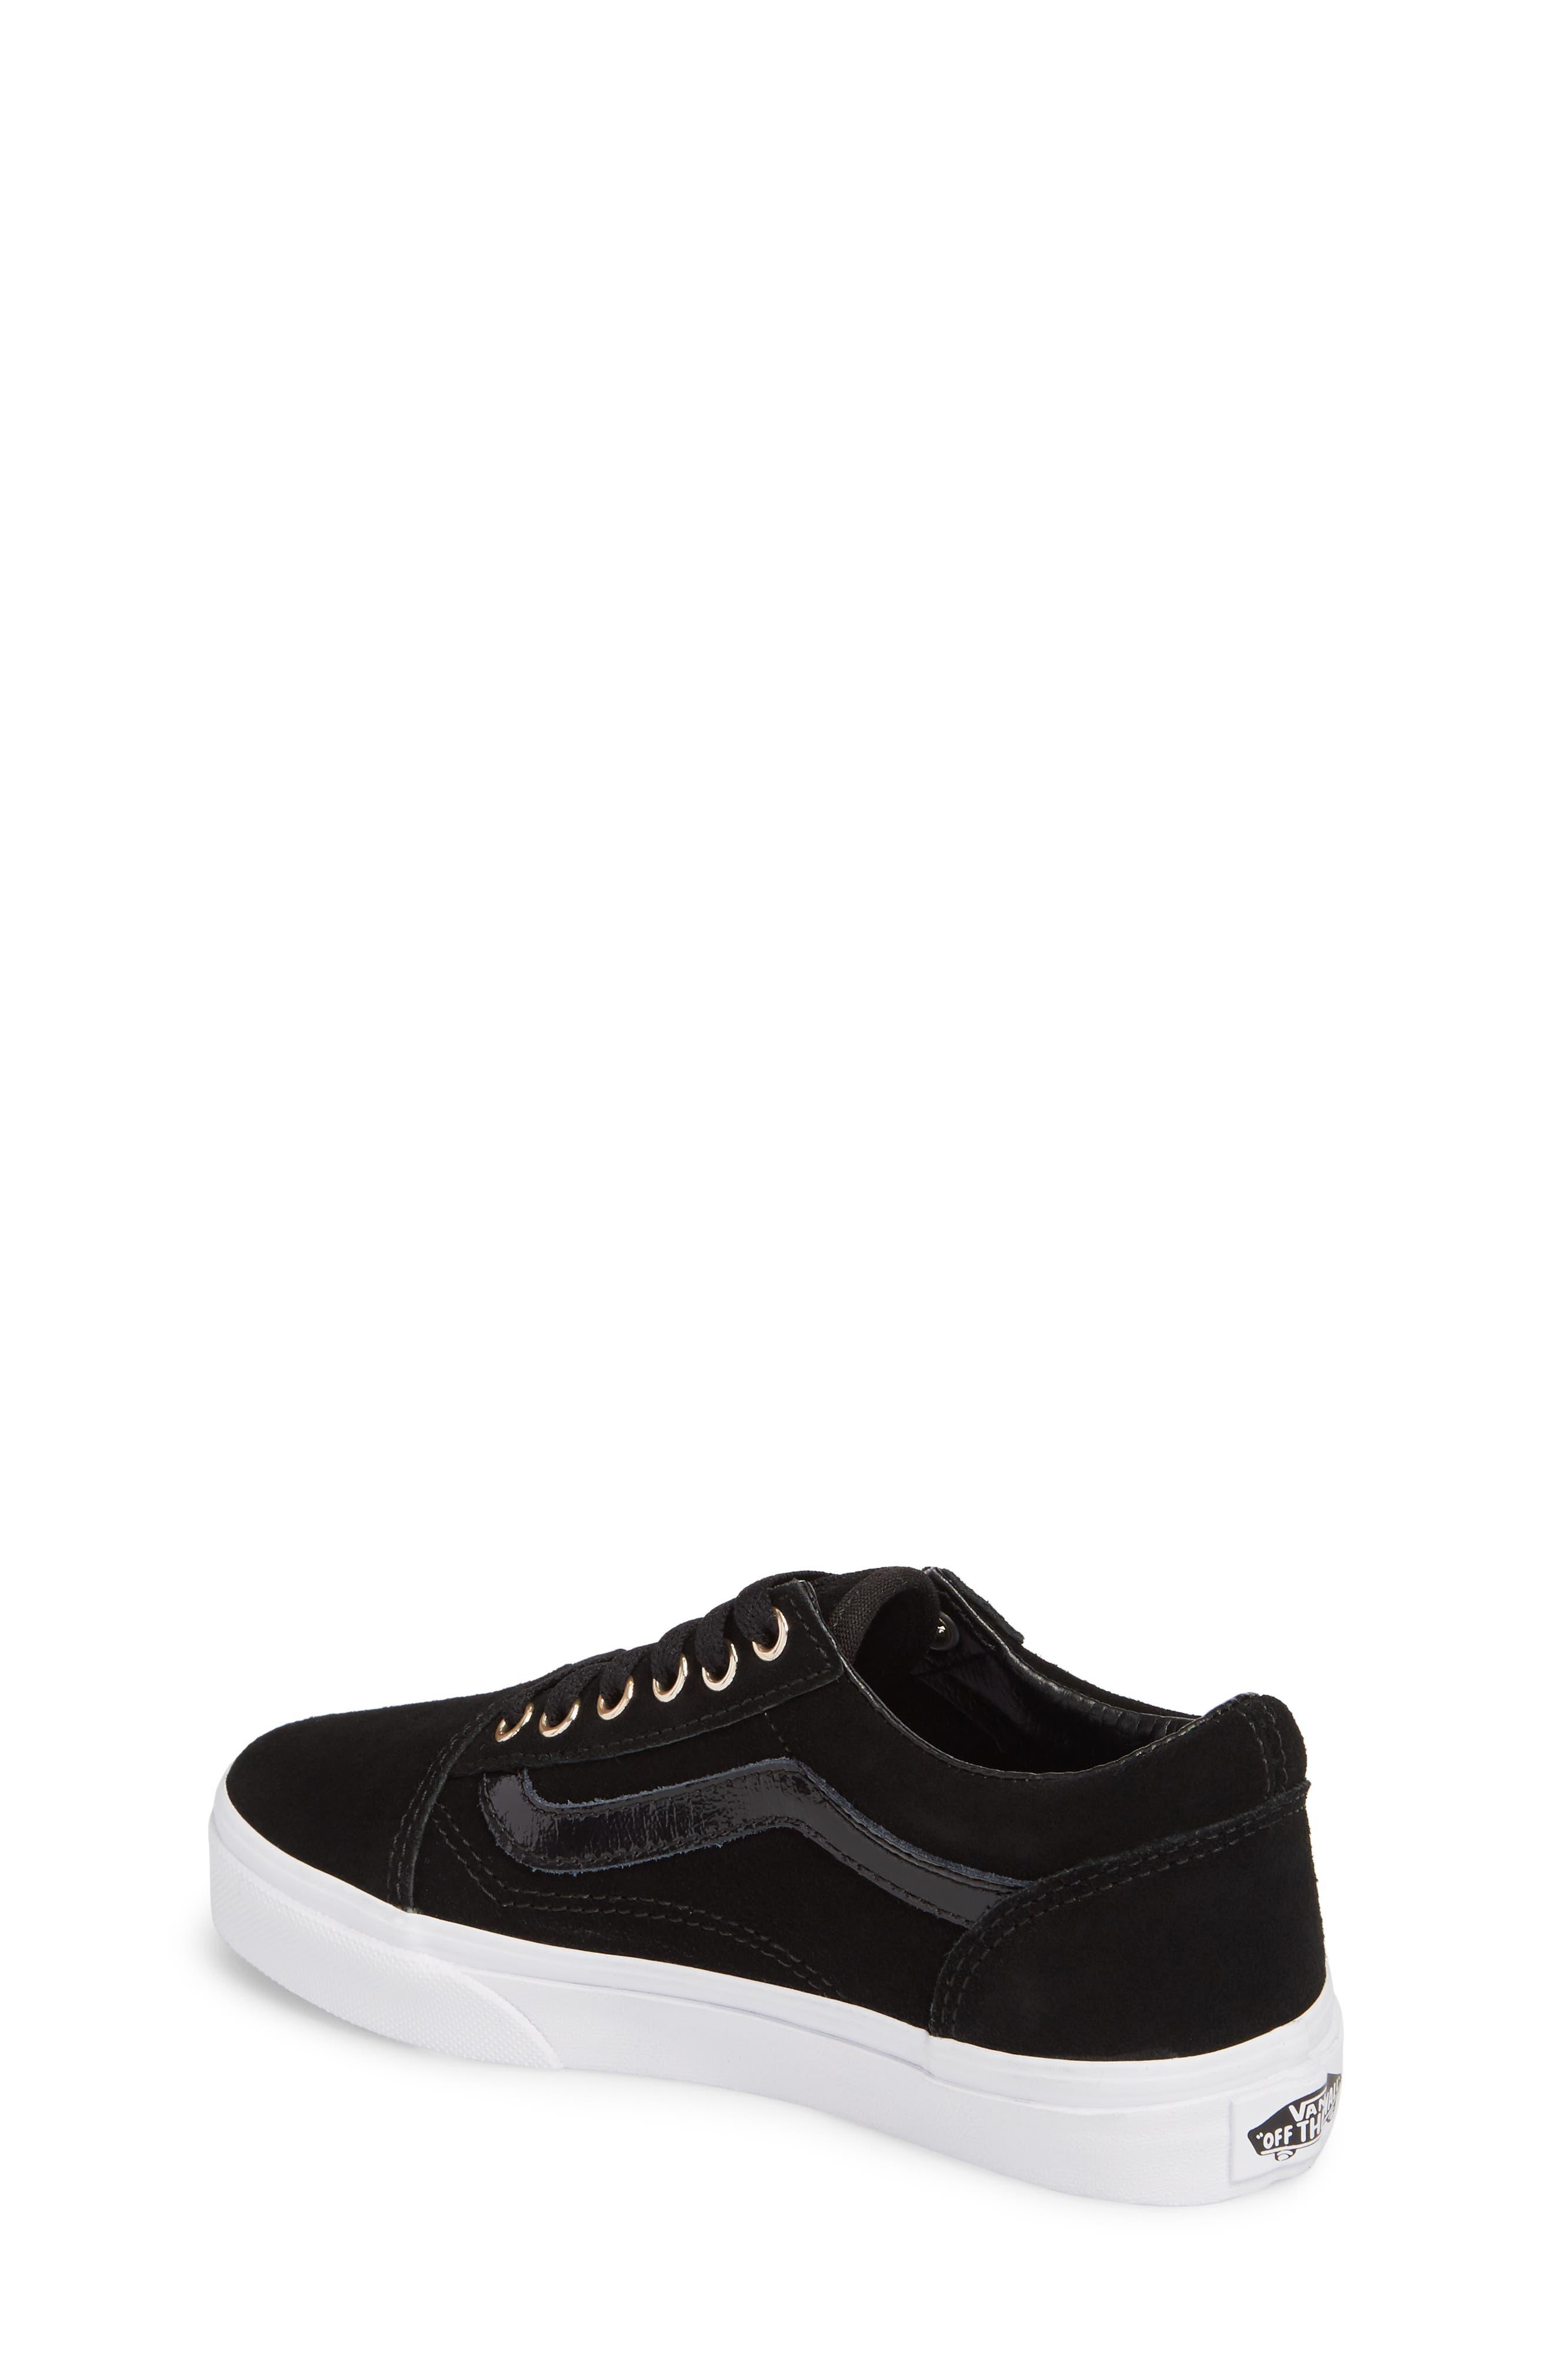 Old Skool Sneaker,                             Alternate thumbnail 2, color,                             Black/ Gold